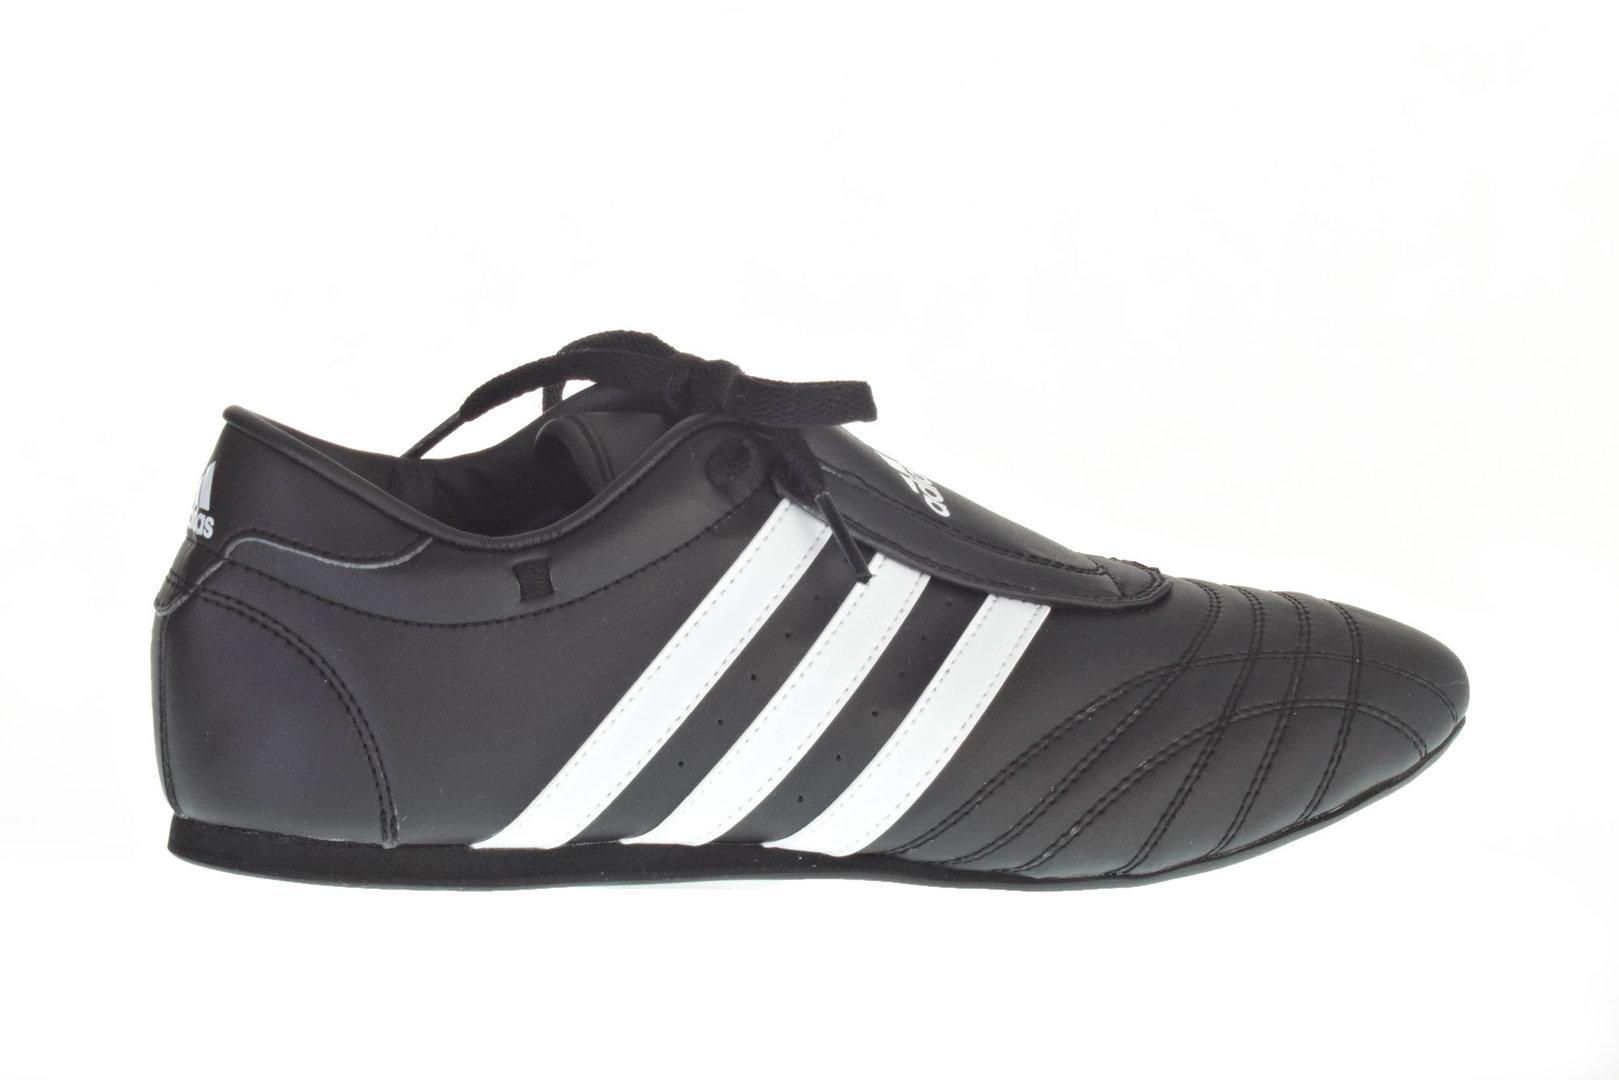 Adidas SM II Sneaker schwarz Kampfsportschuhe